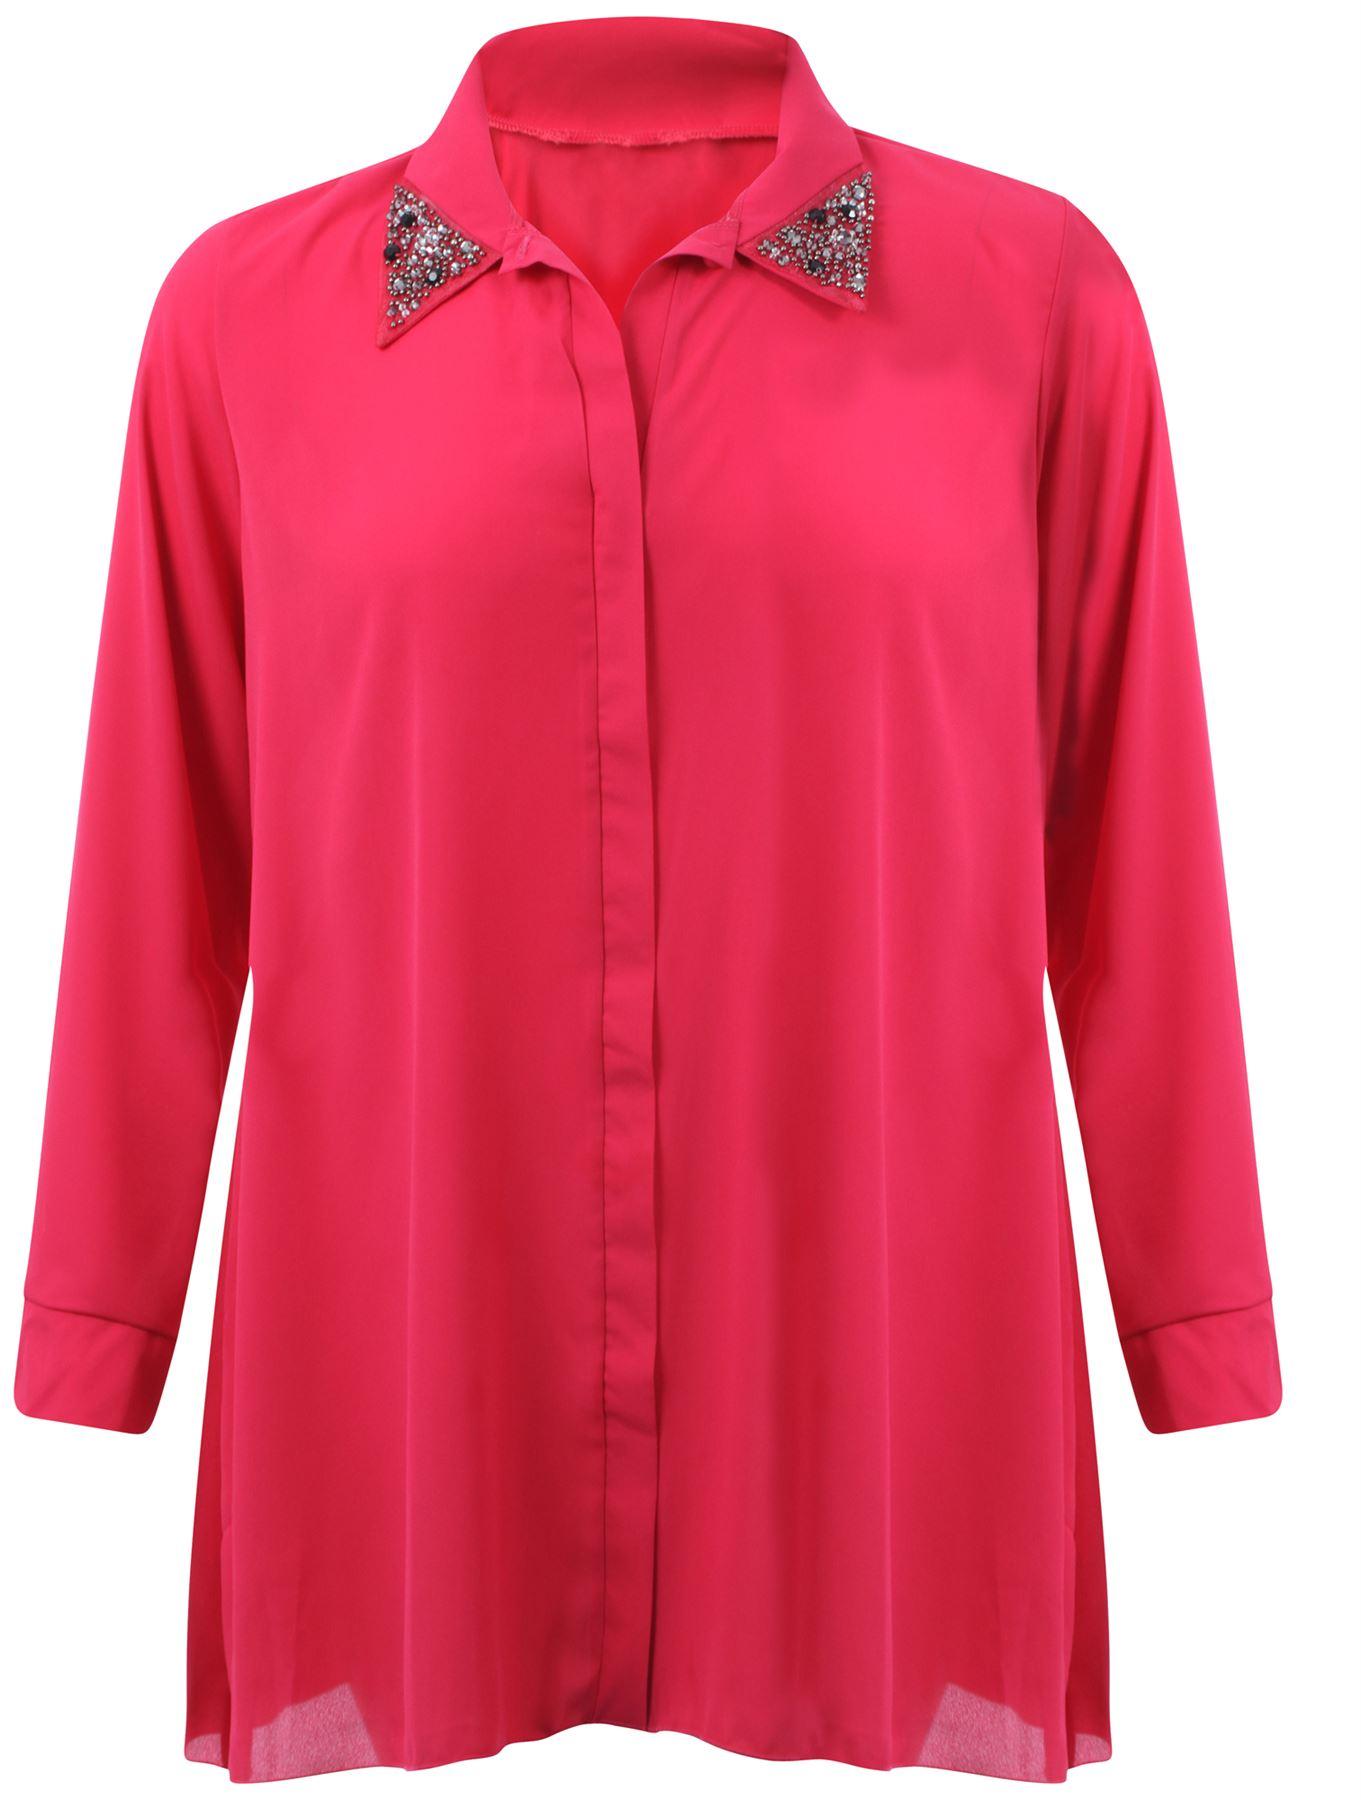 Ladies Plus Size Chiffon Shirt Dress Collar Studded